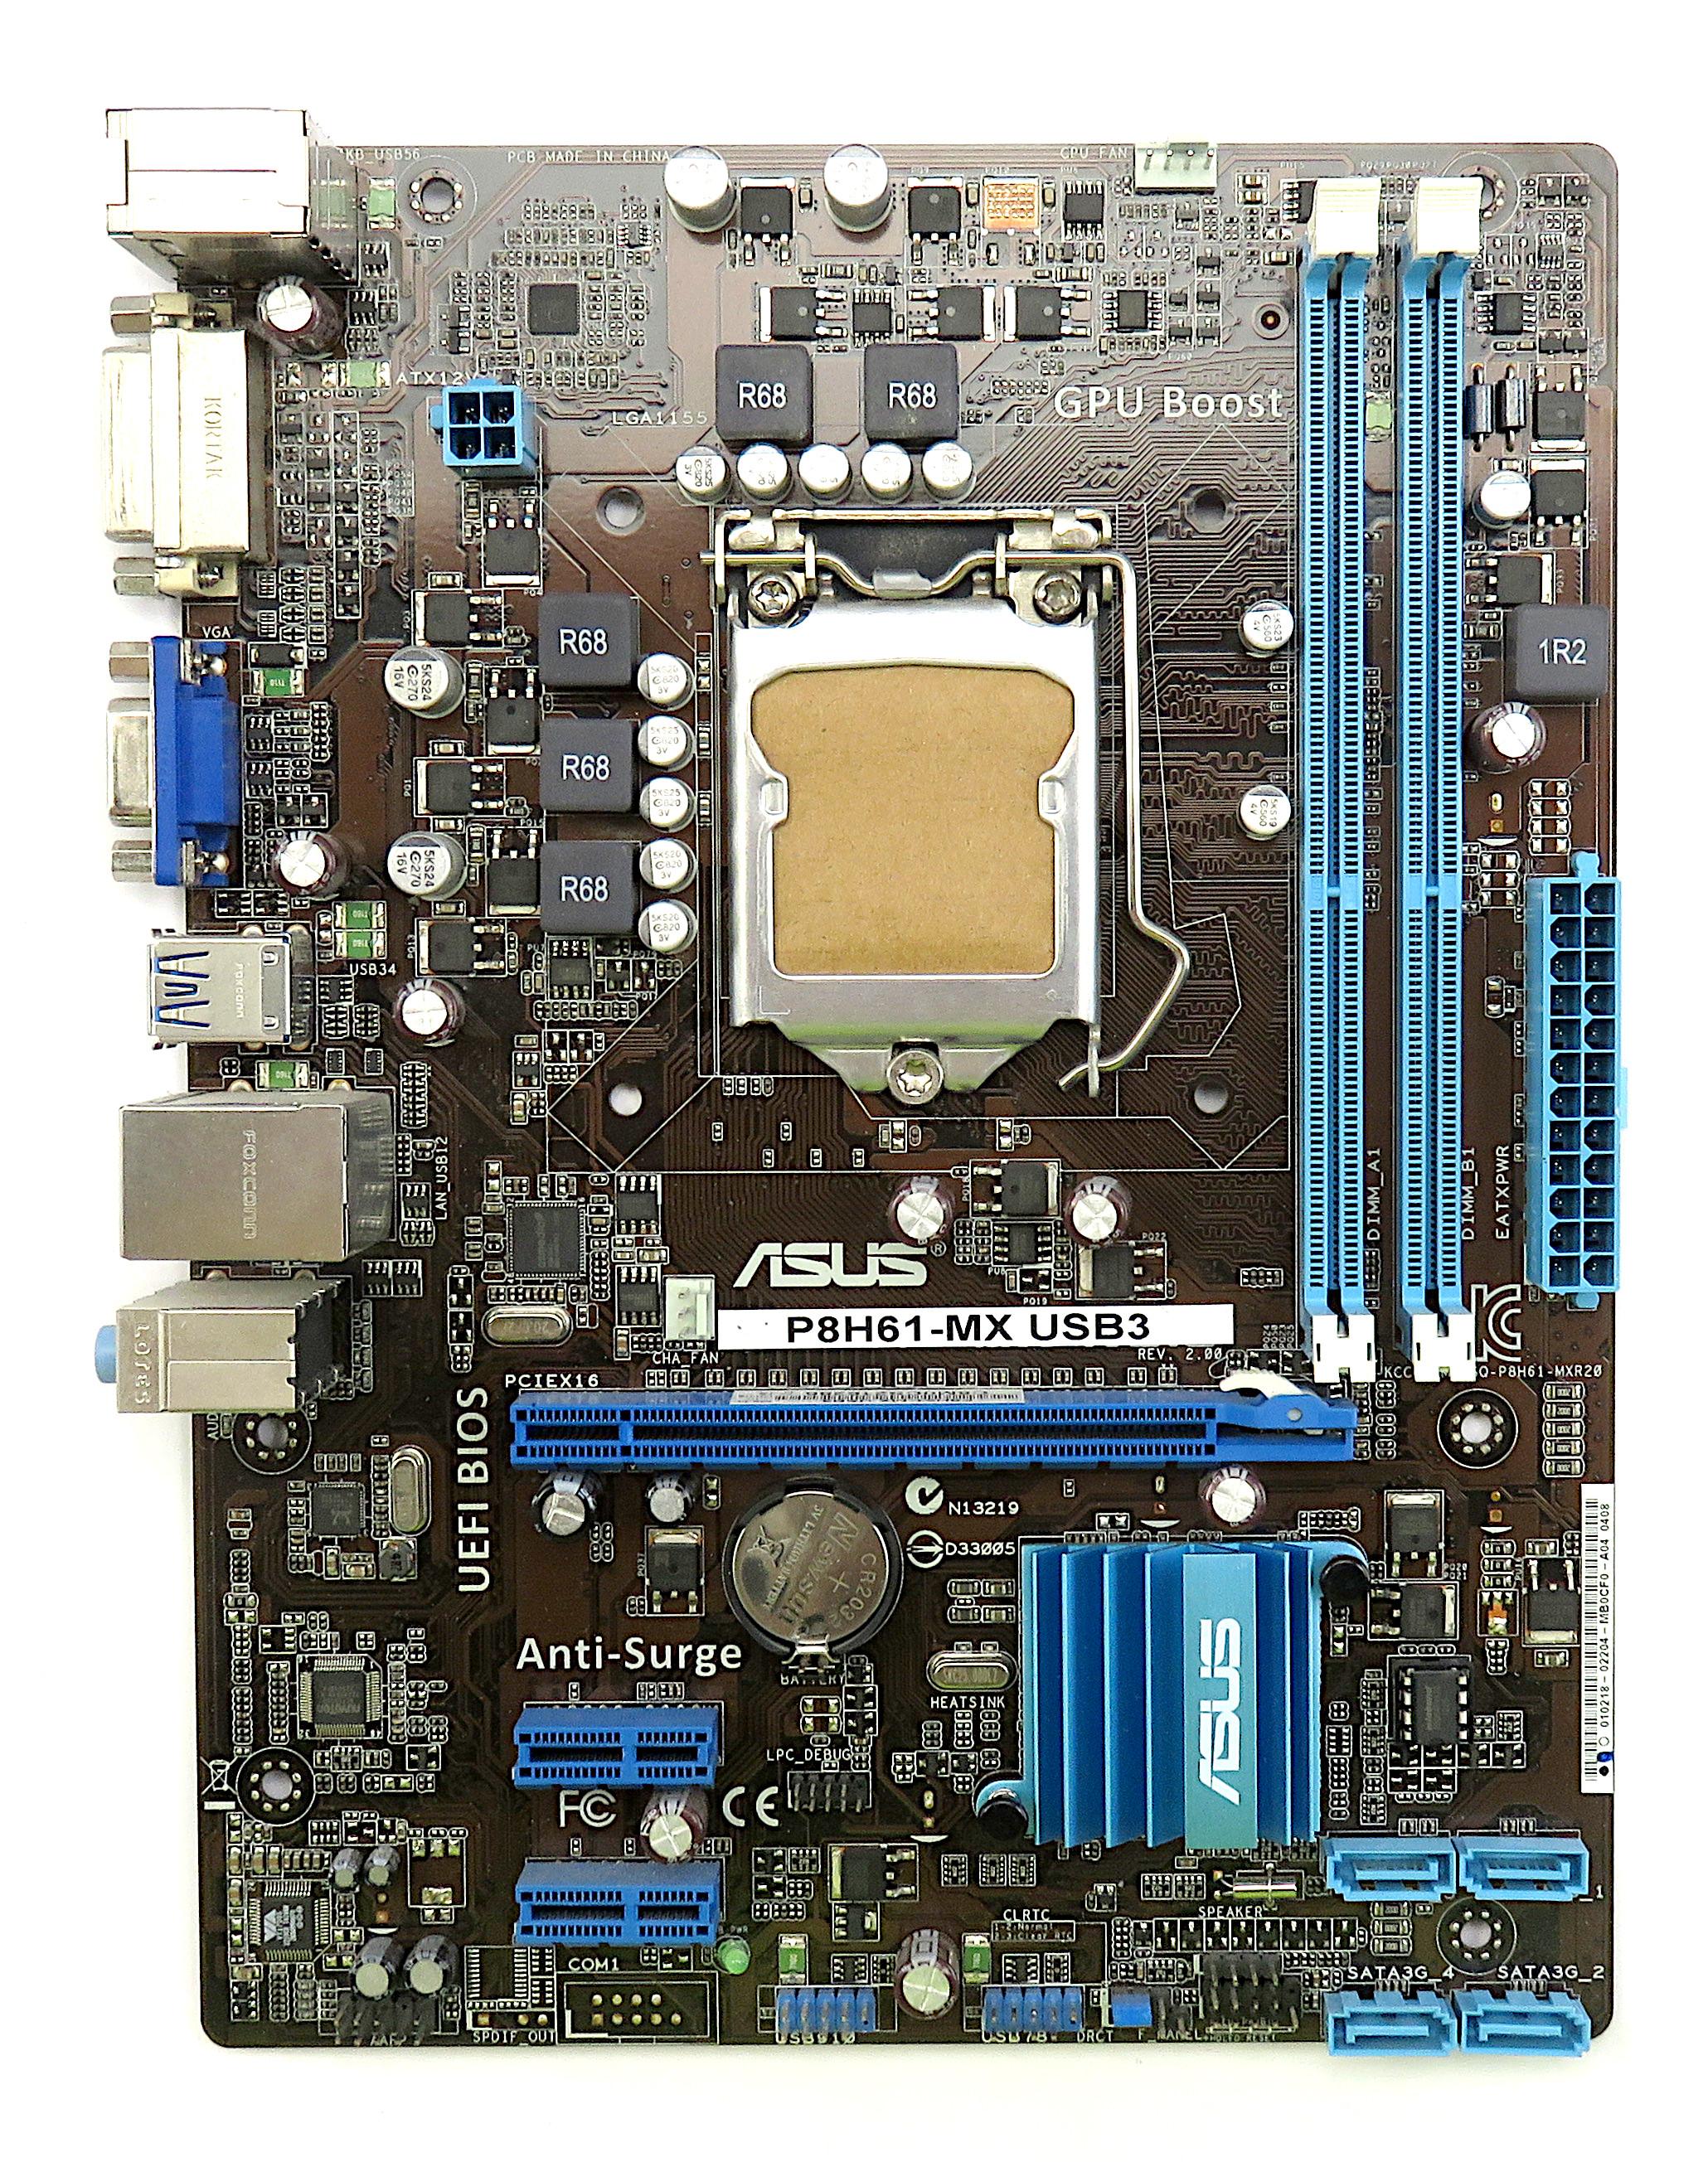 Asus P8H61-MX USB3 Intel Socket 1155 2nd/3rd Gen. mATX Motherboard